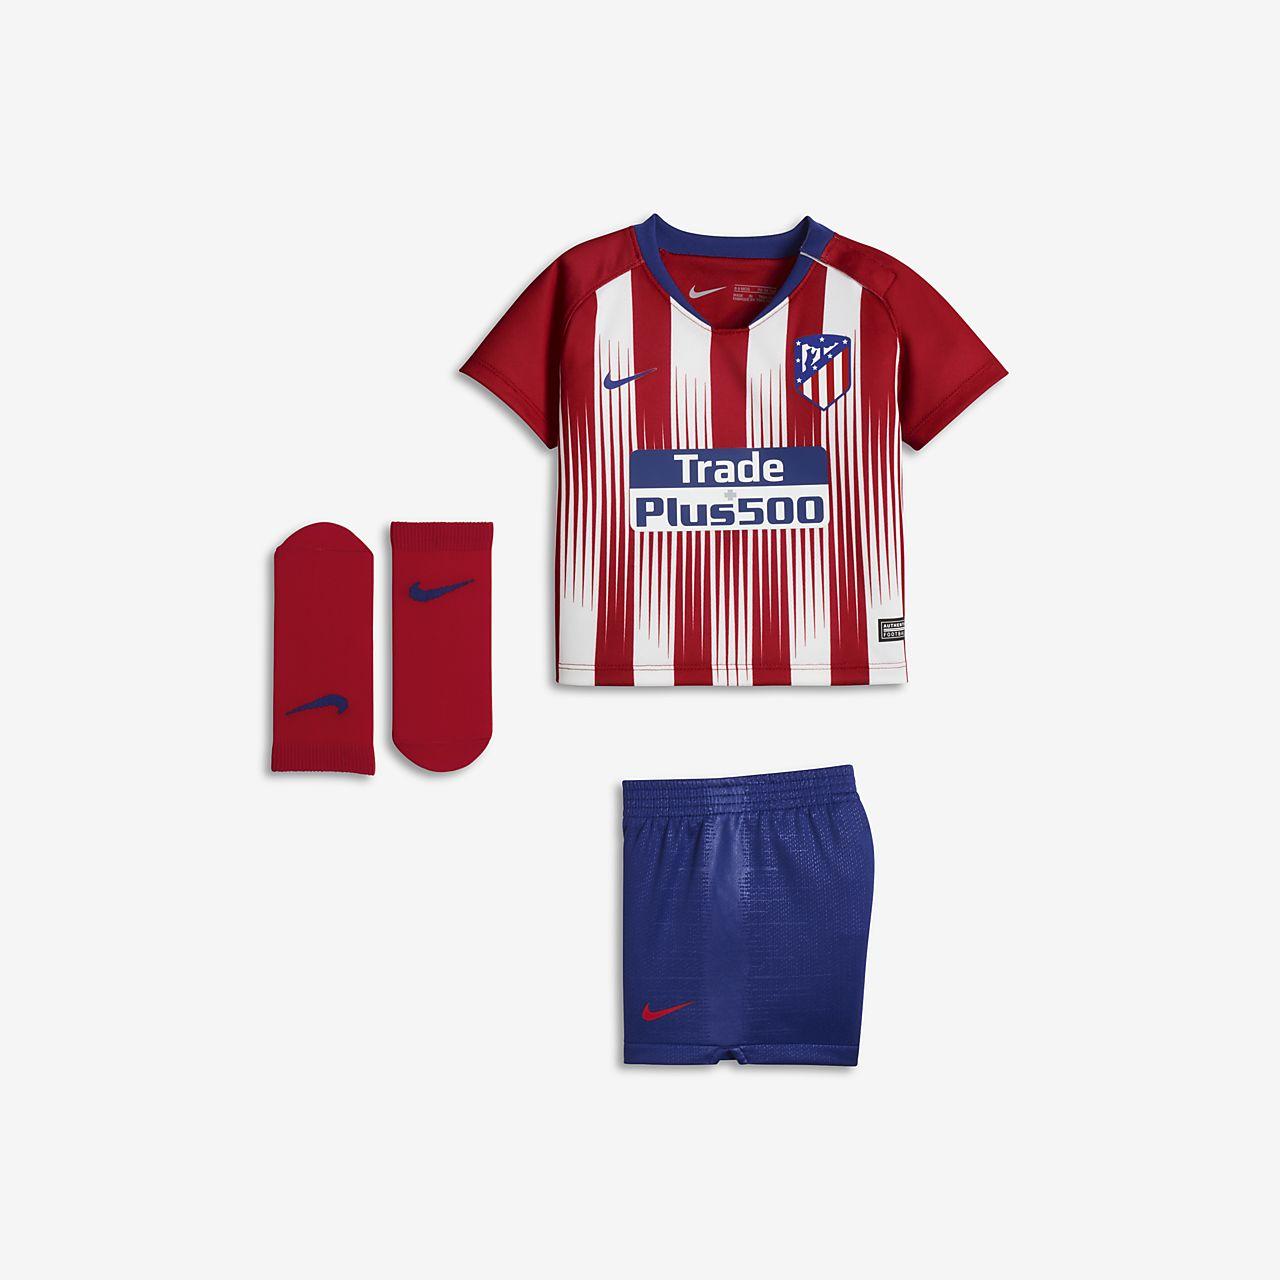 69fdd84636e 2018/19 Atlético de Madrid Stadium Home Baby & Toddler Football ...